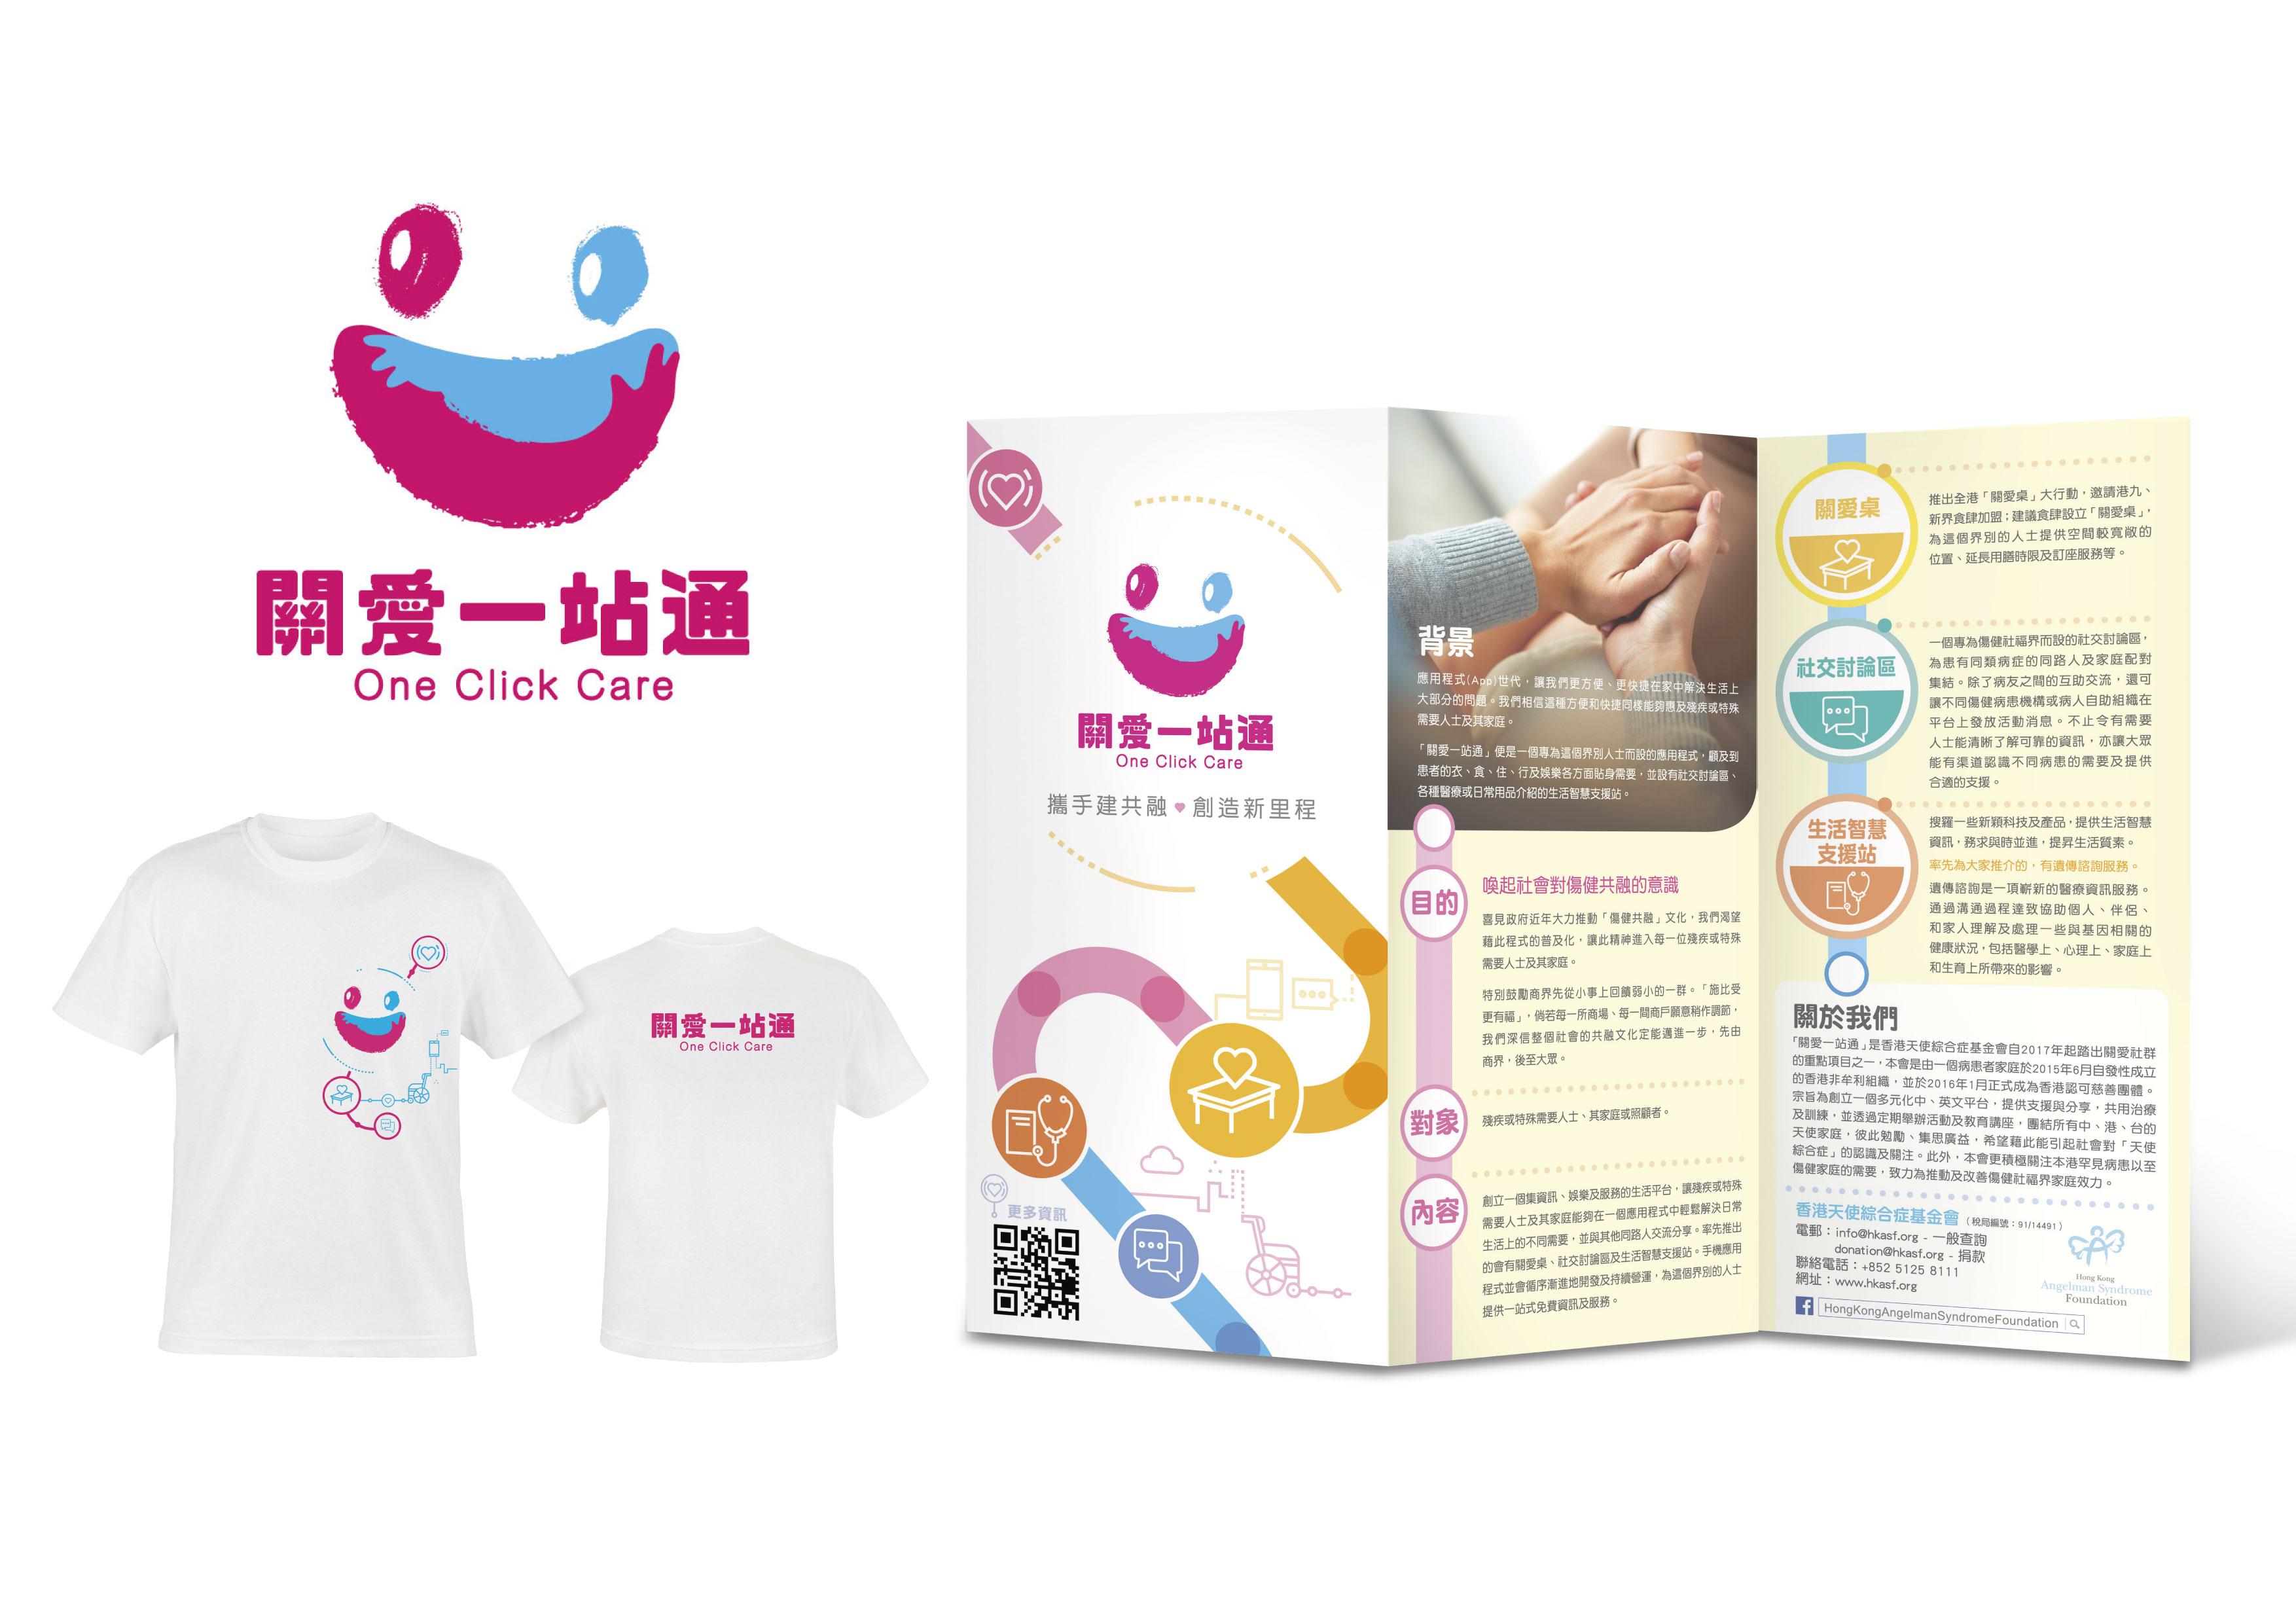 One Click Care Branding